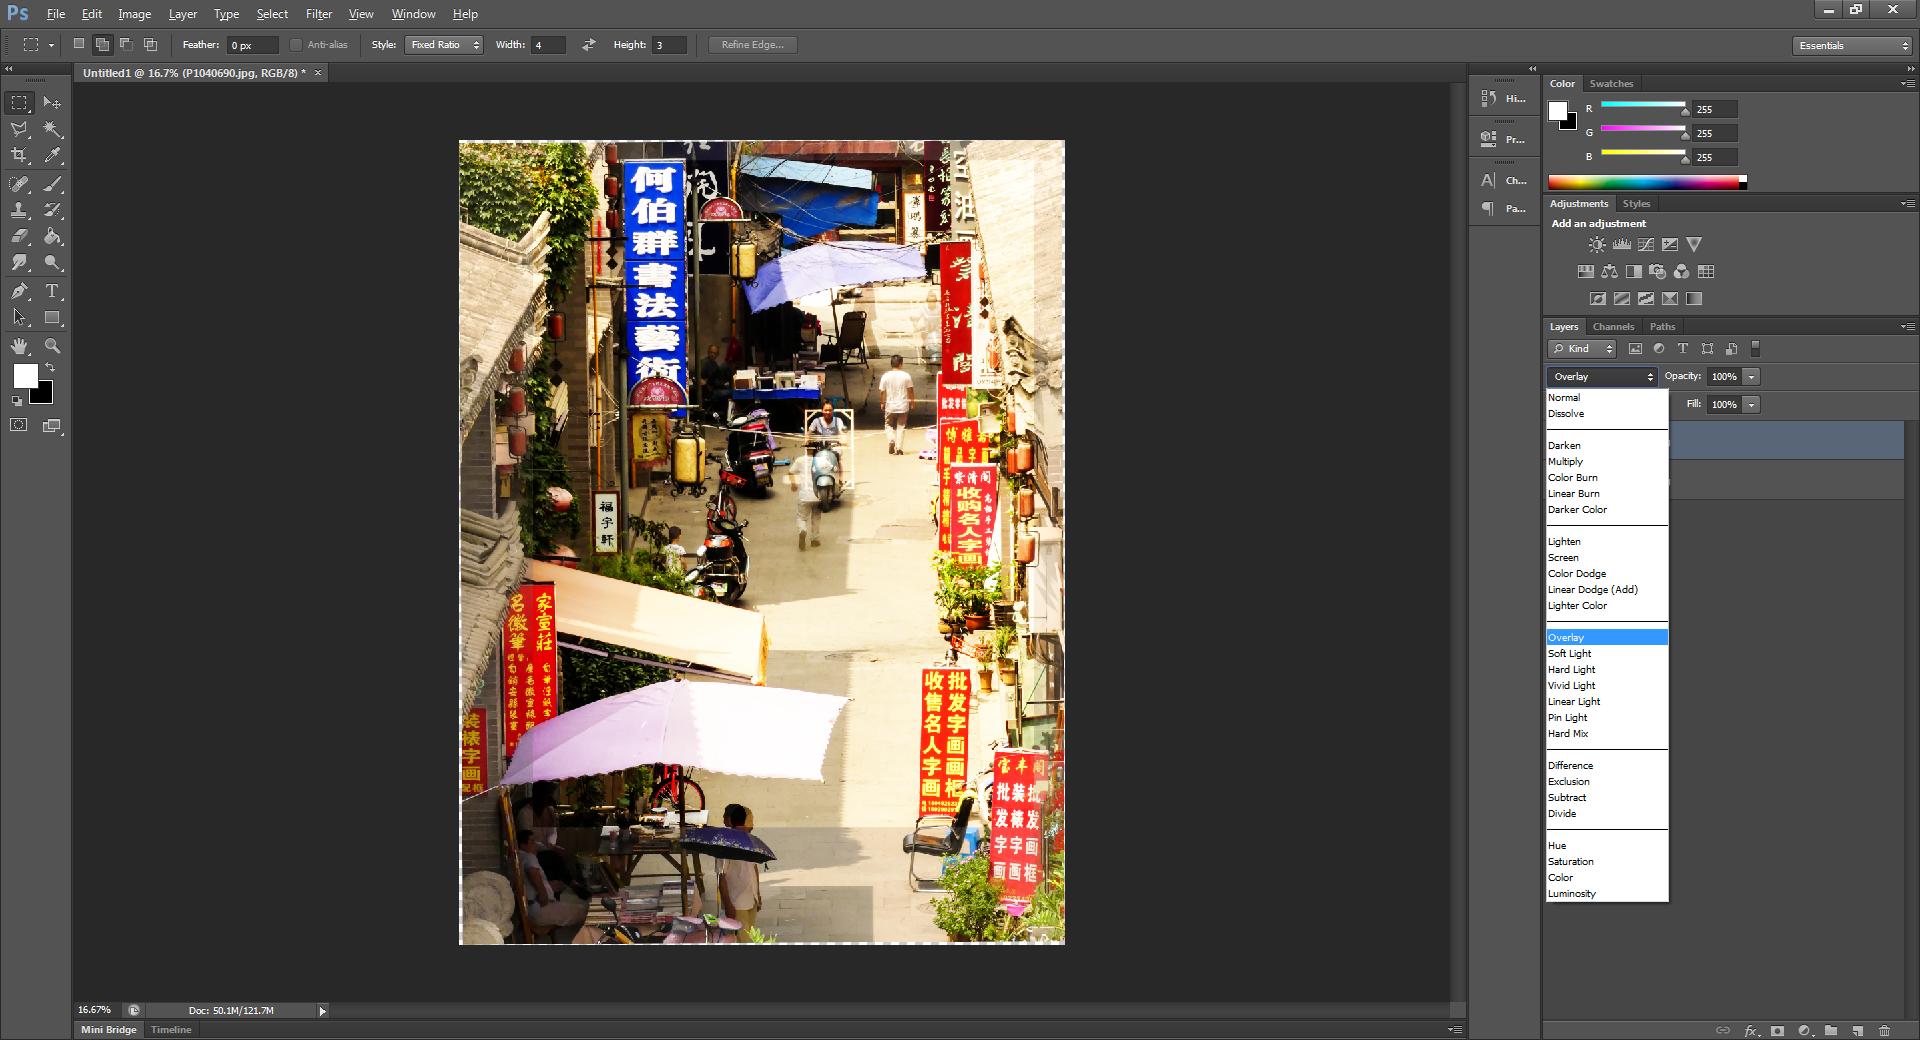 Using the overlay blend mode